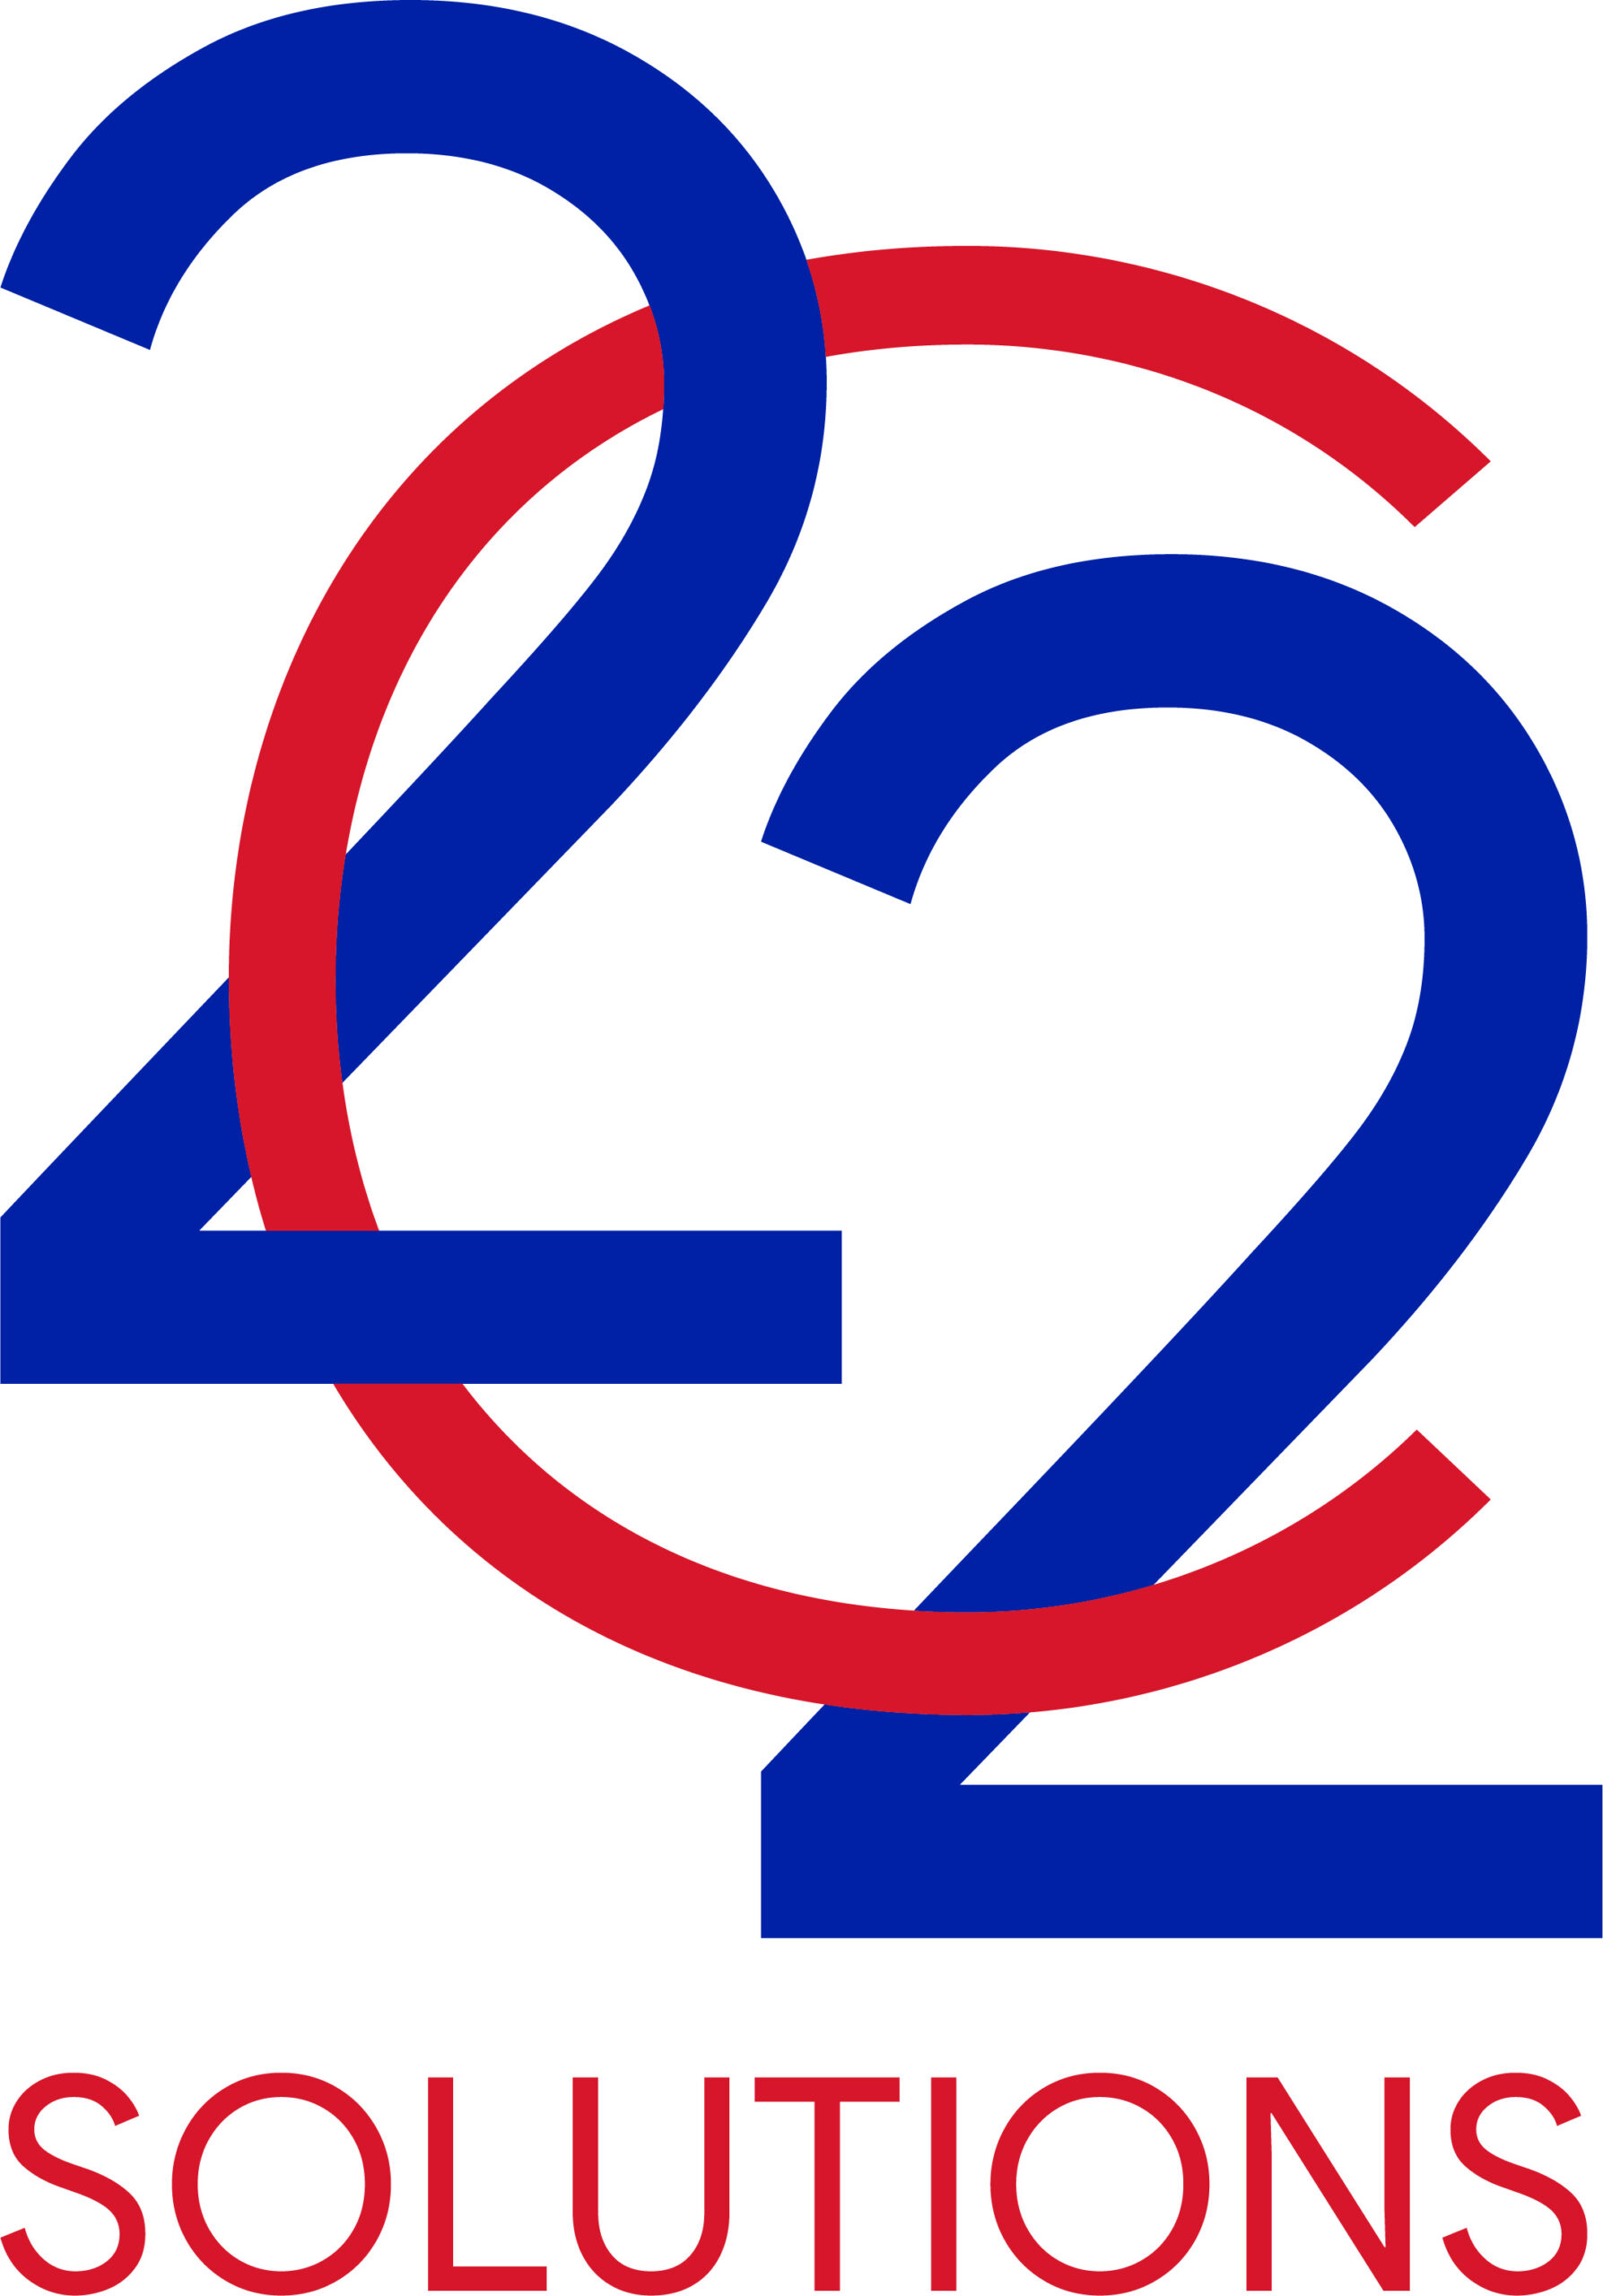 Century 22 Solutions